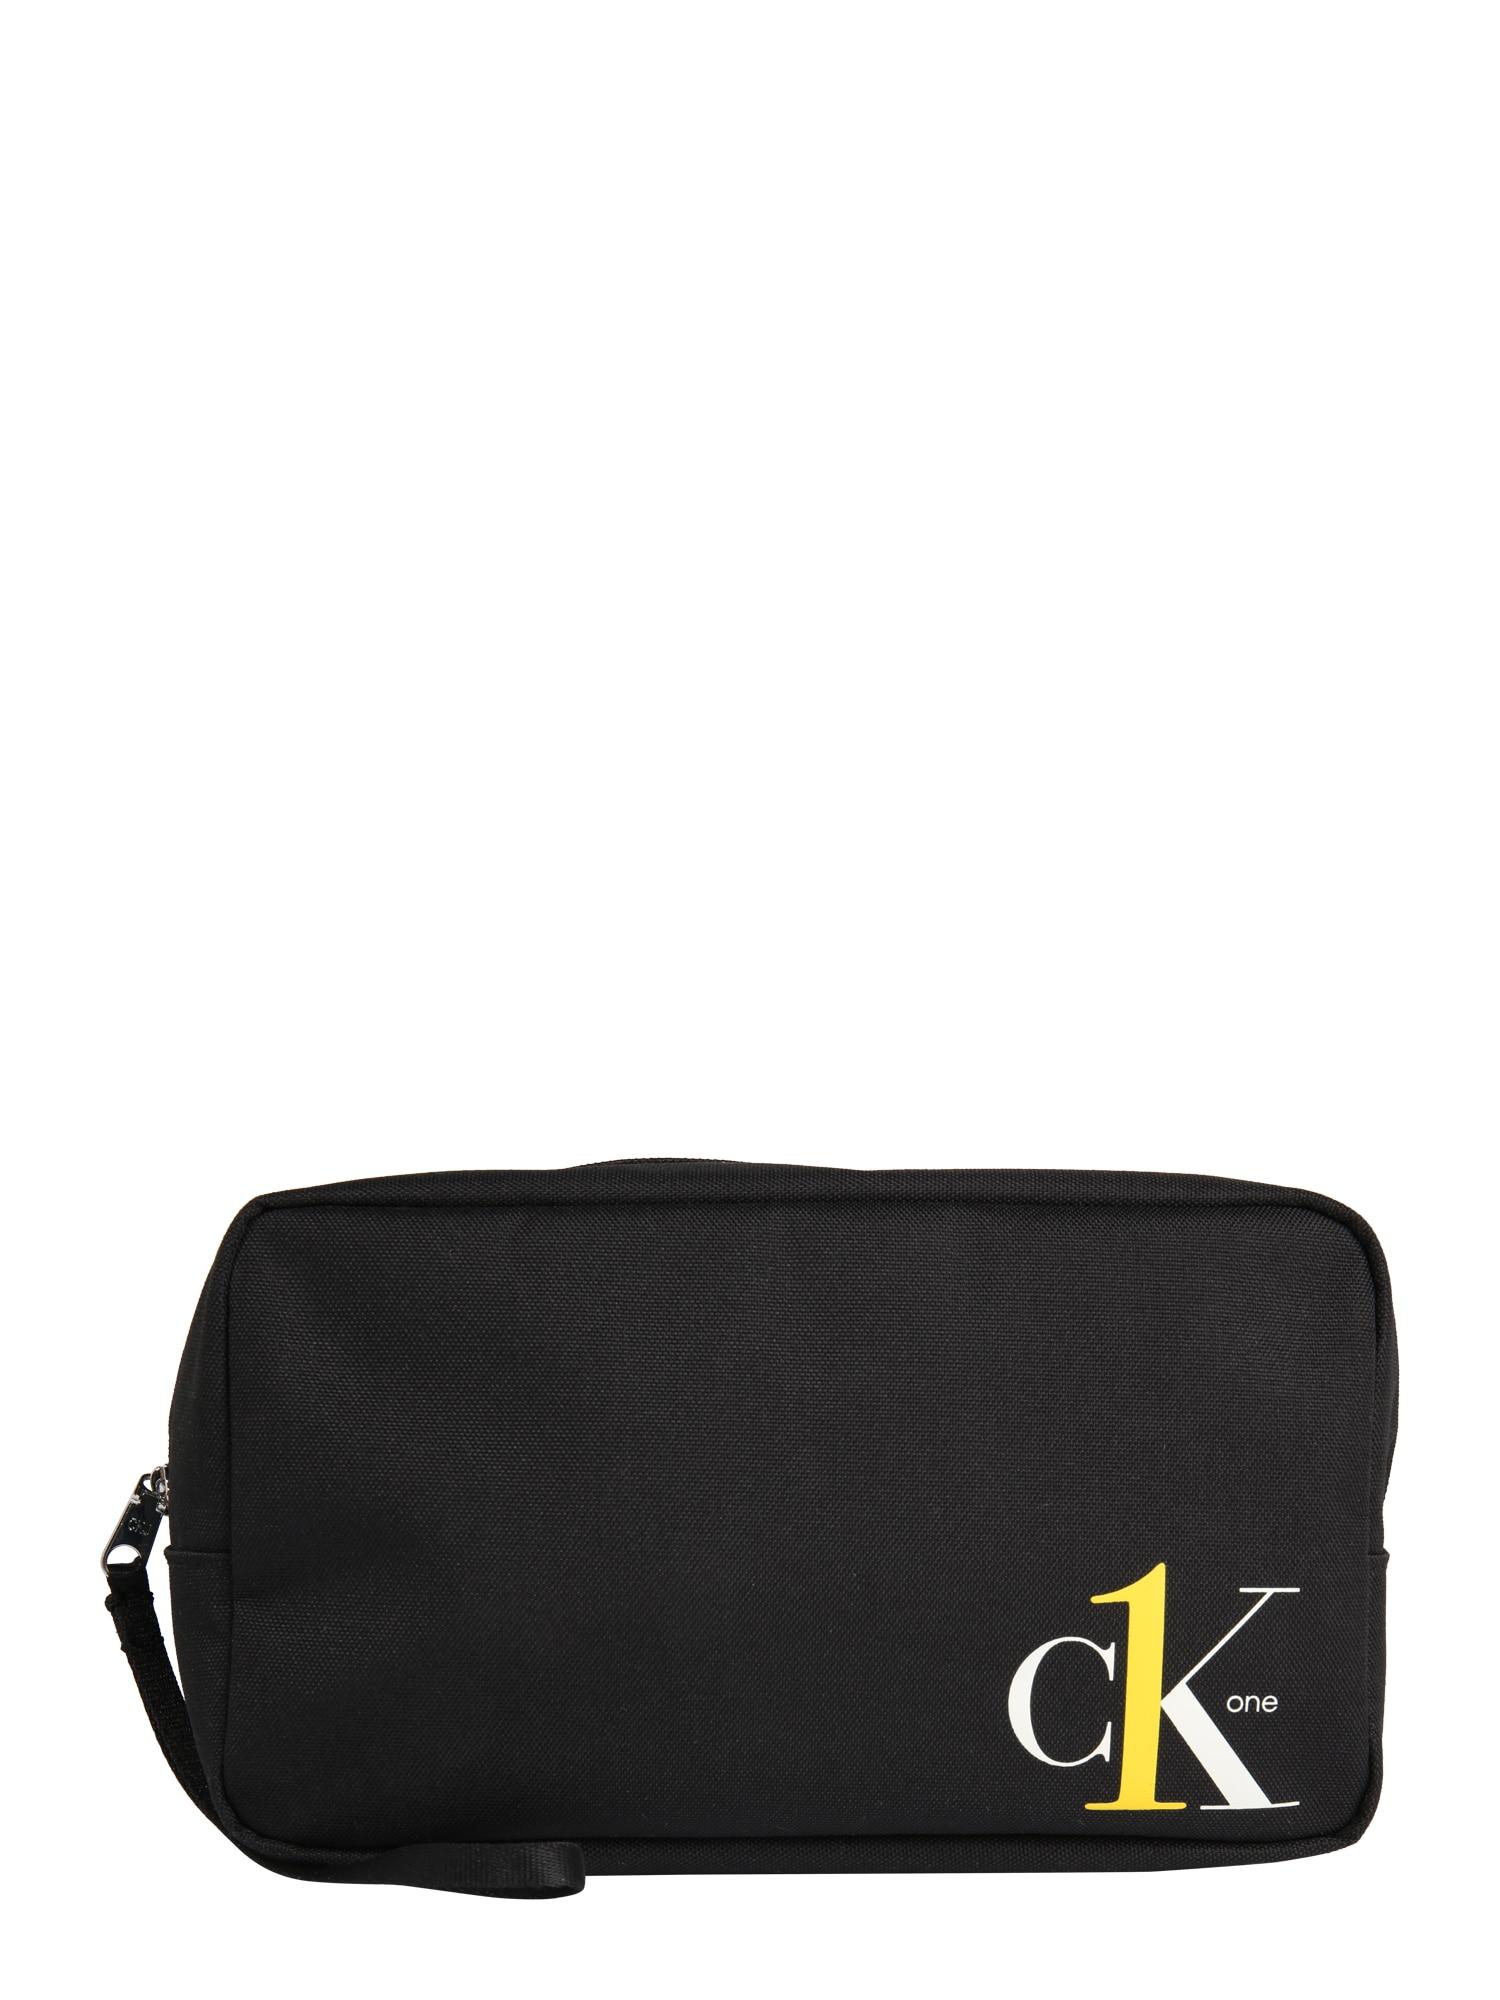 Calvin Klein Jeans Tualeto reikmenų / kosmetikos krepšys balta / juoda